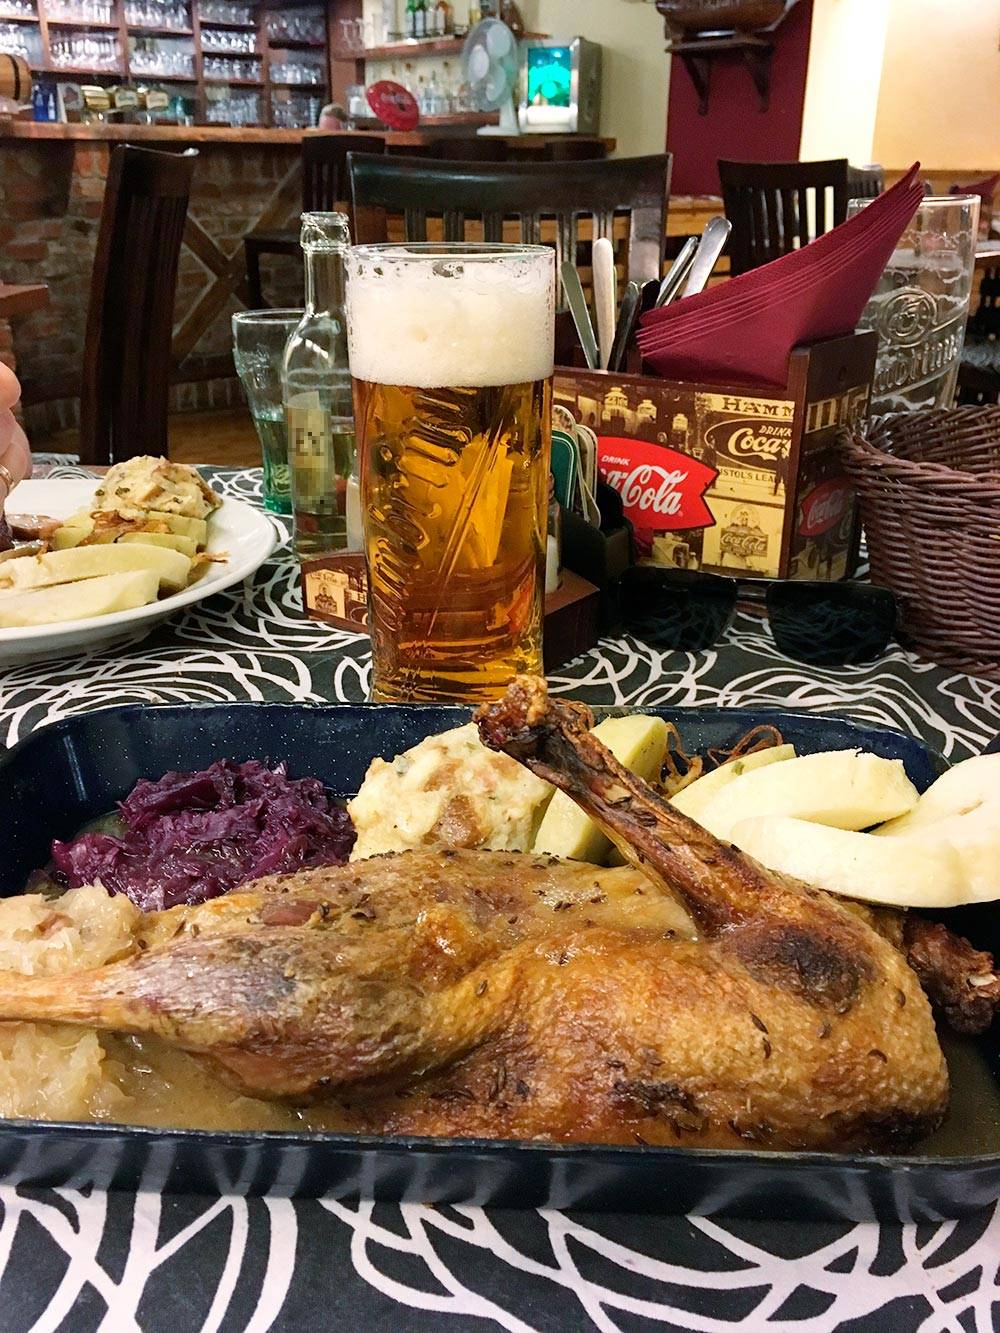 Обед в Чехии: половина утки, клецки кнедлики, капуста и пиво